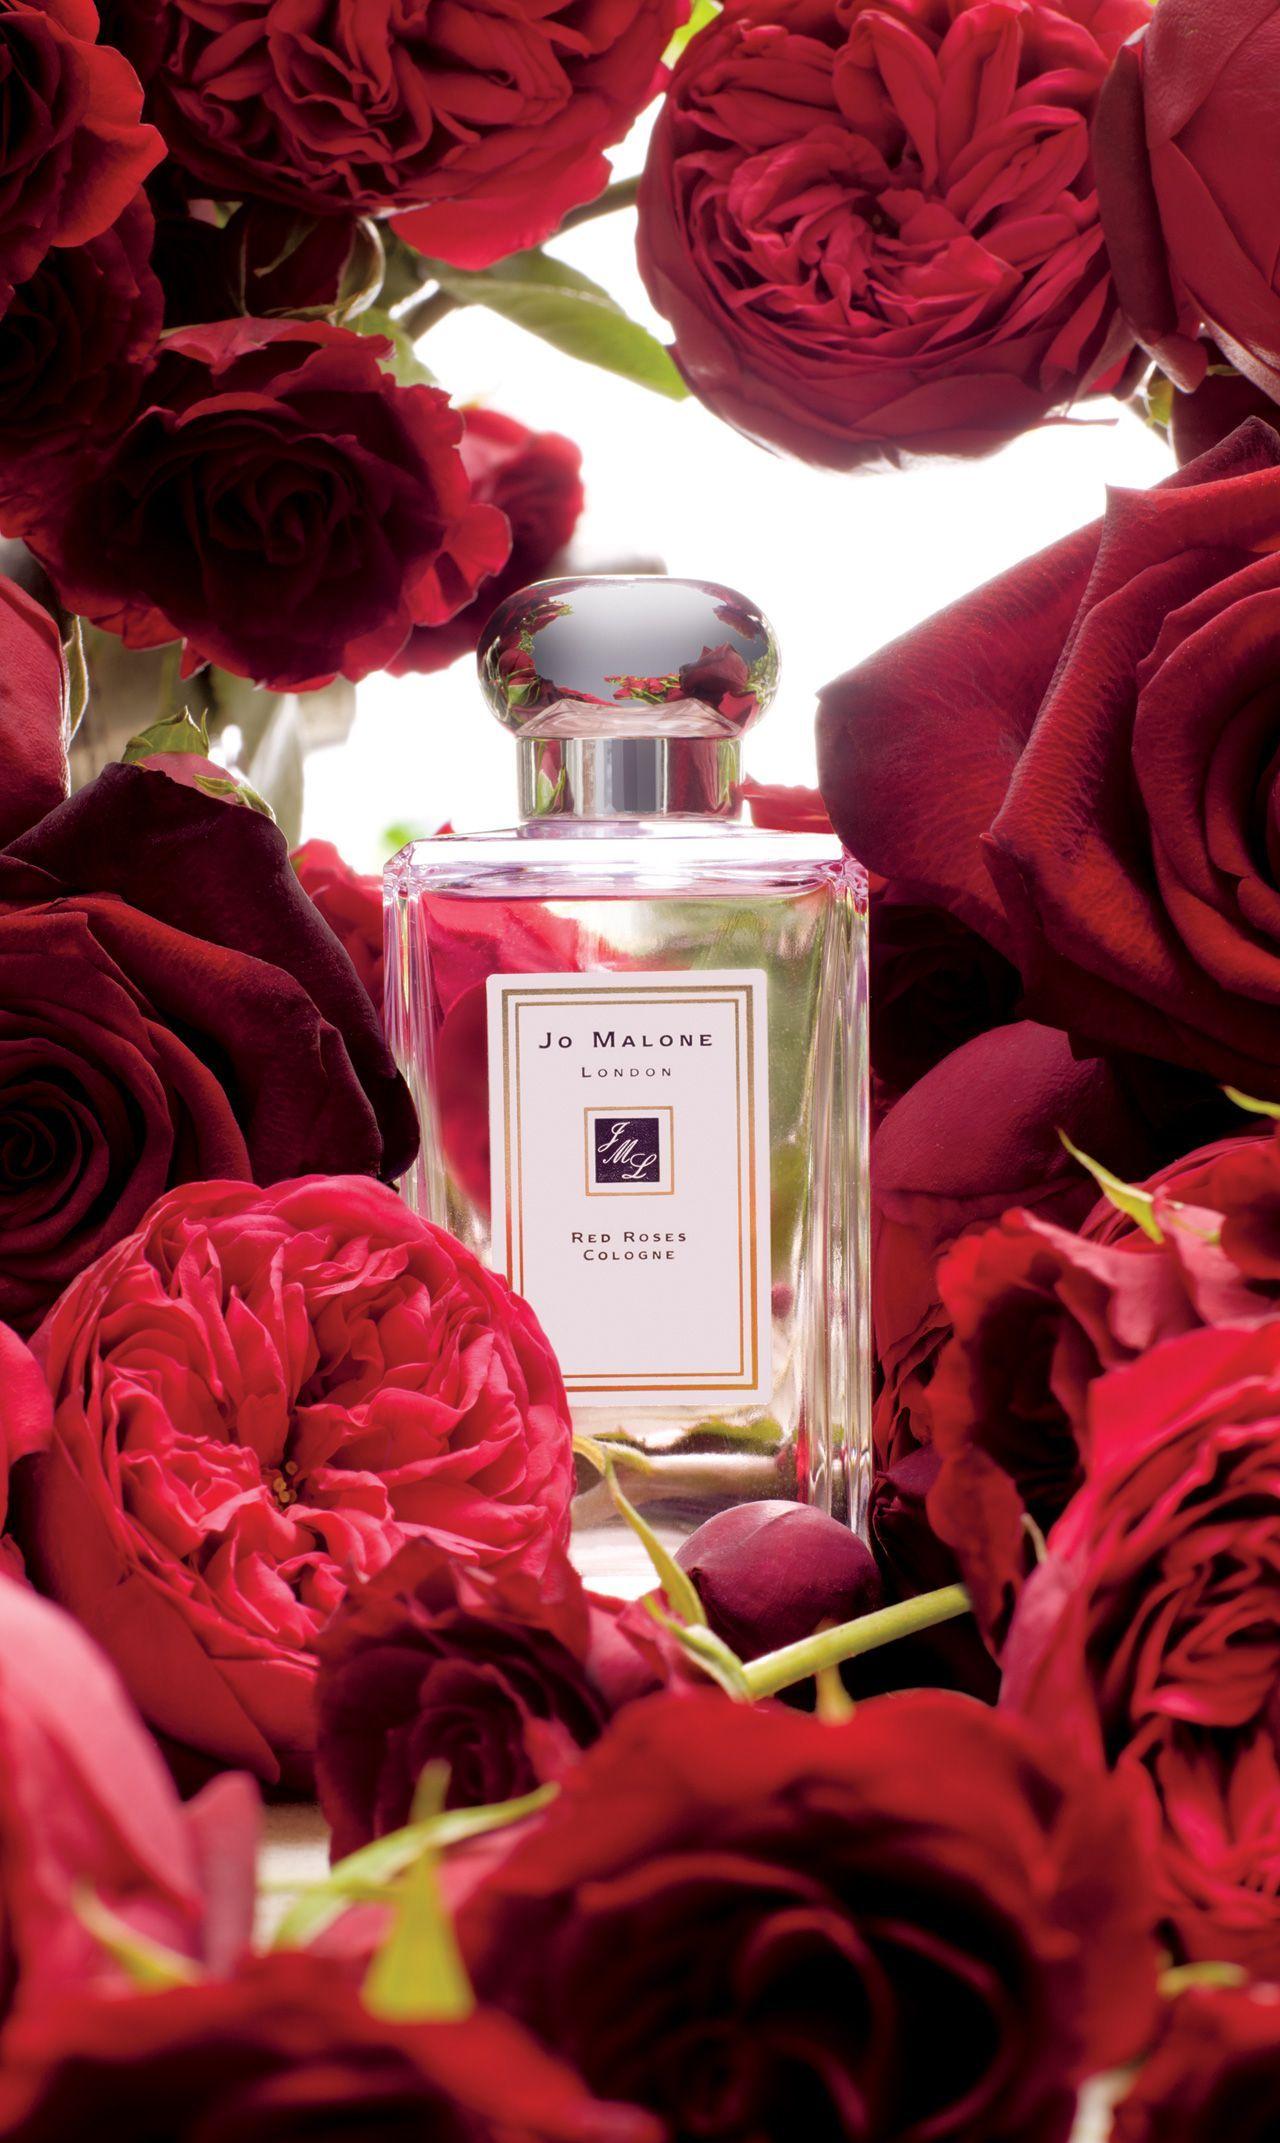 Pin By Ela Simoneaux On Fragrance Perfumes Cologne In 2020 Red Roses Cologne Perfume Jo Malone Perfume